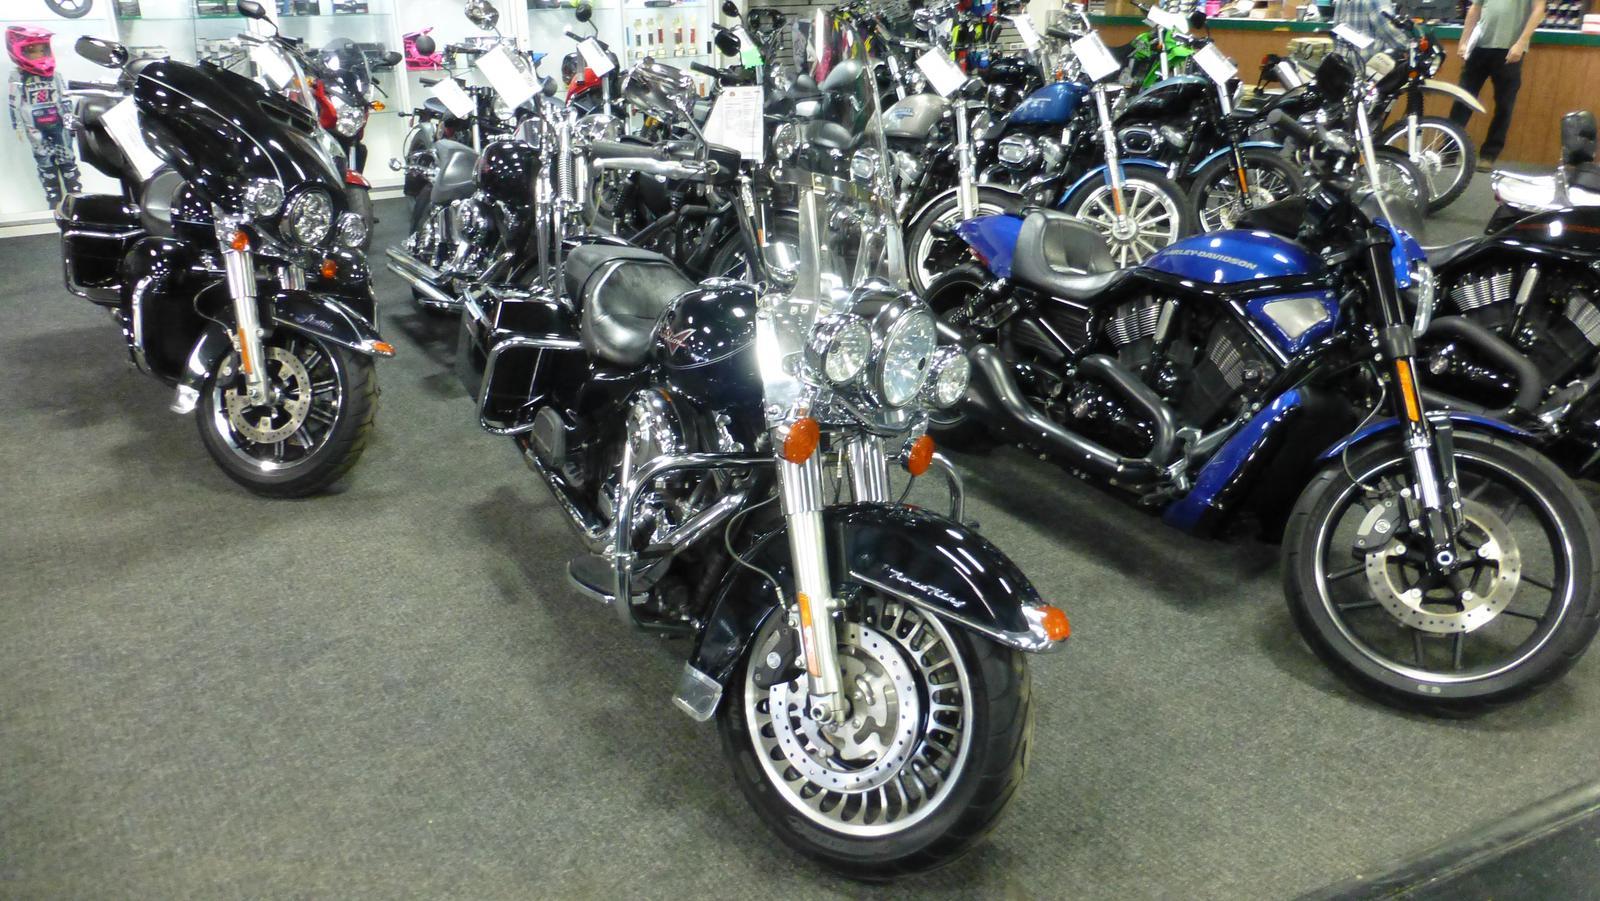 2013 Harley-Davidson® ROAD KING (EFI)